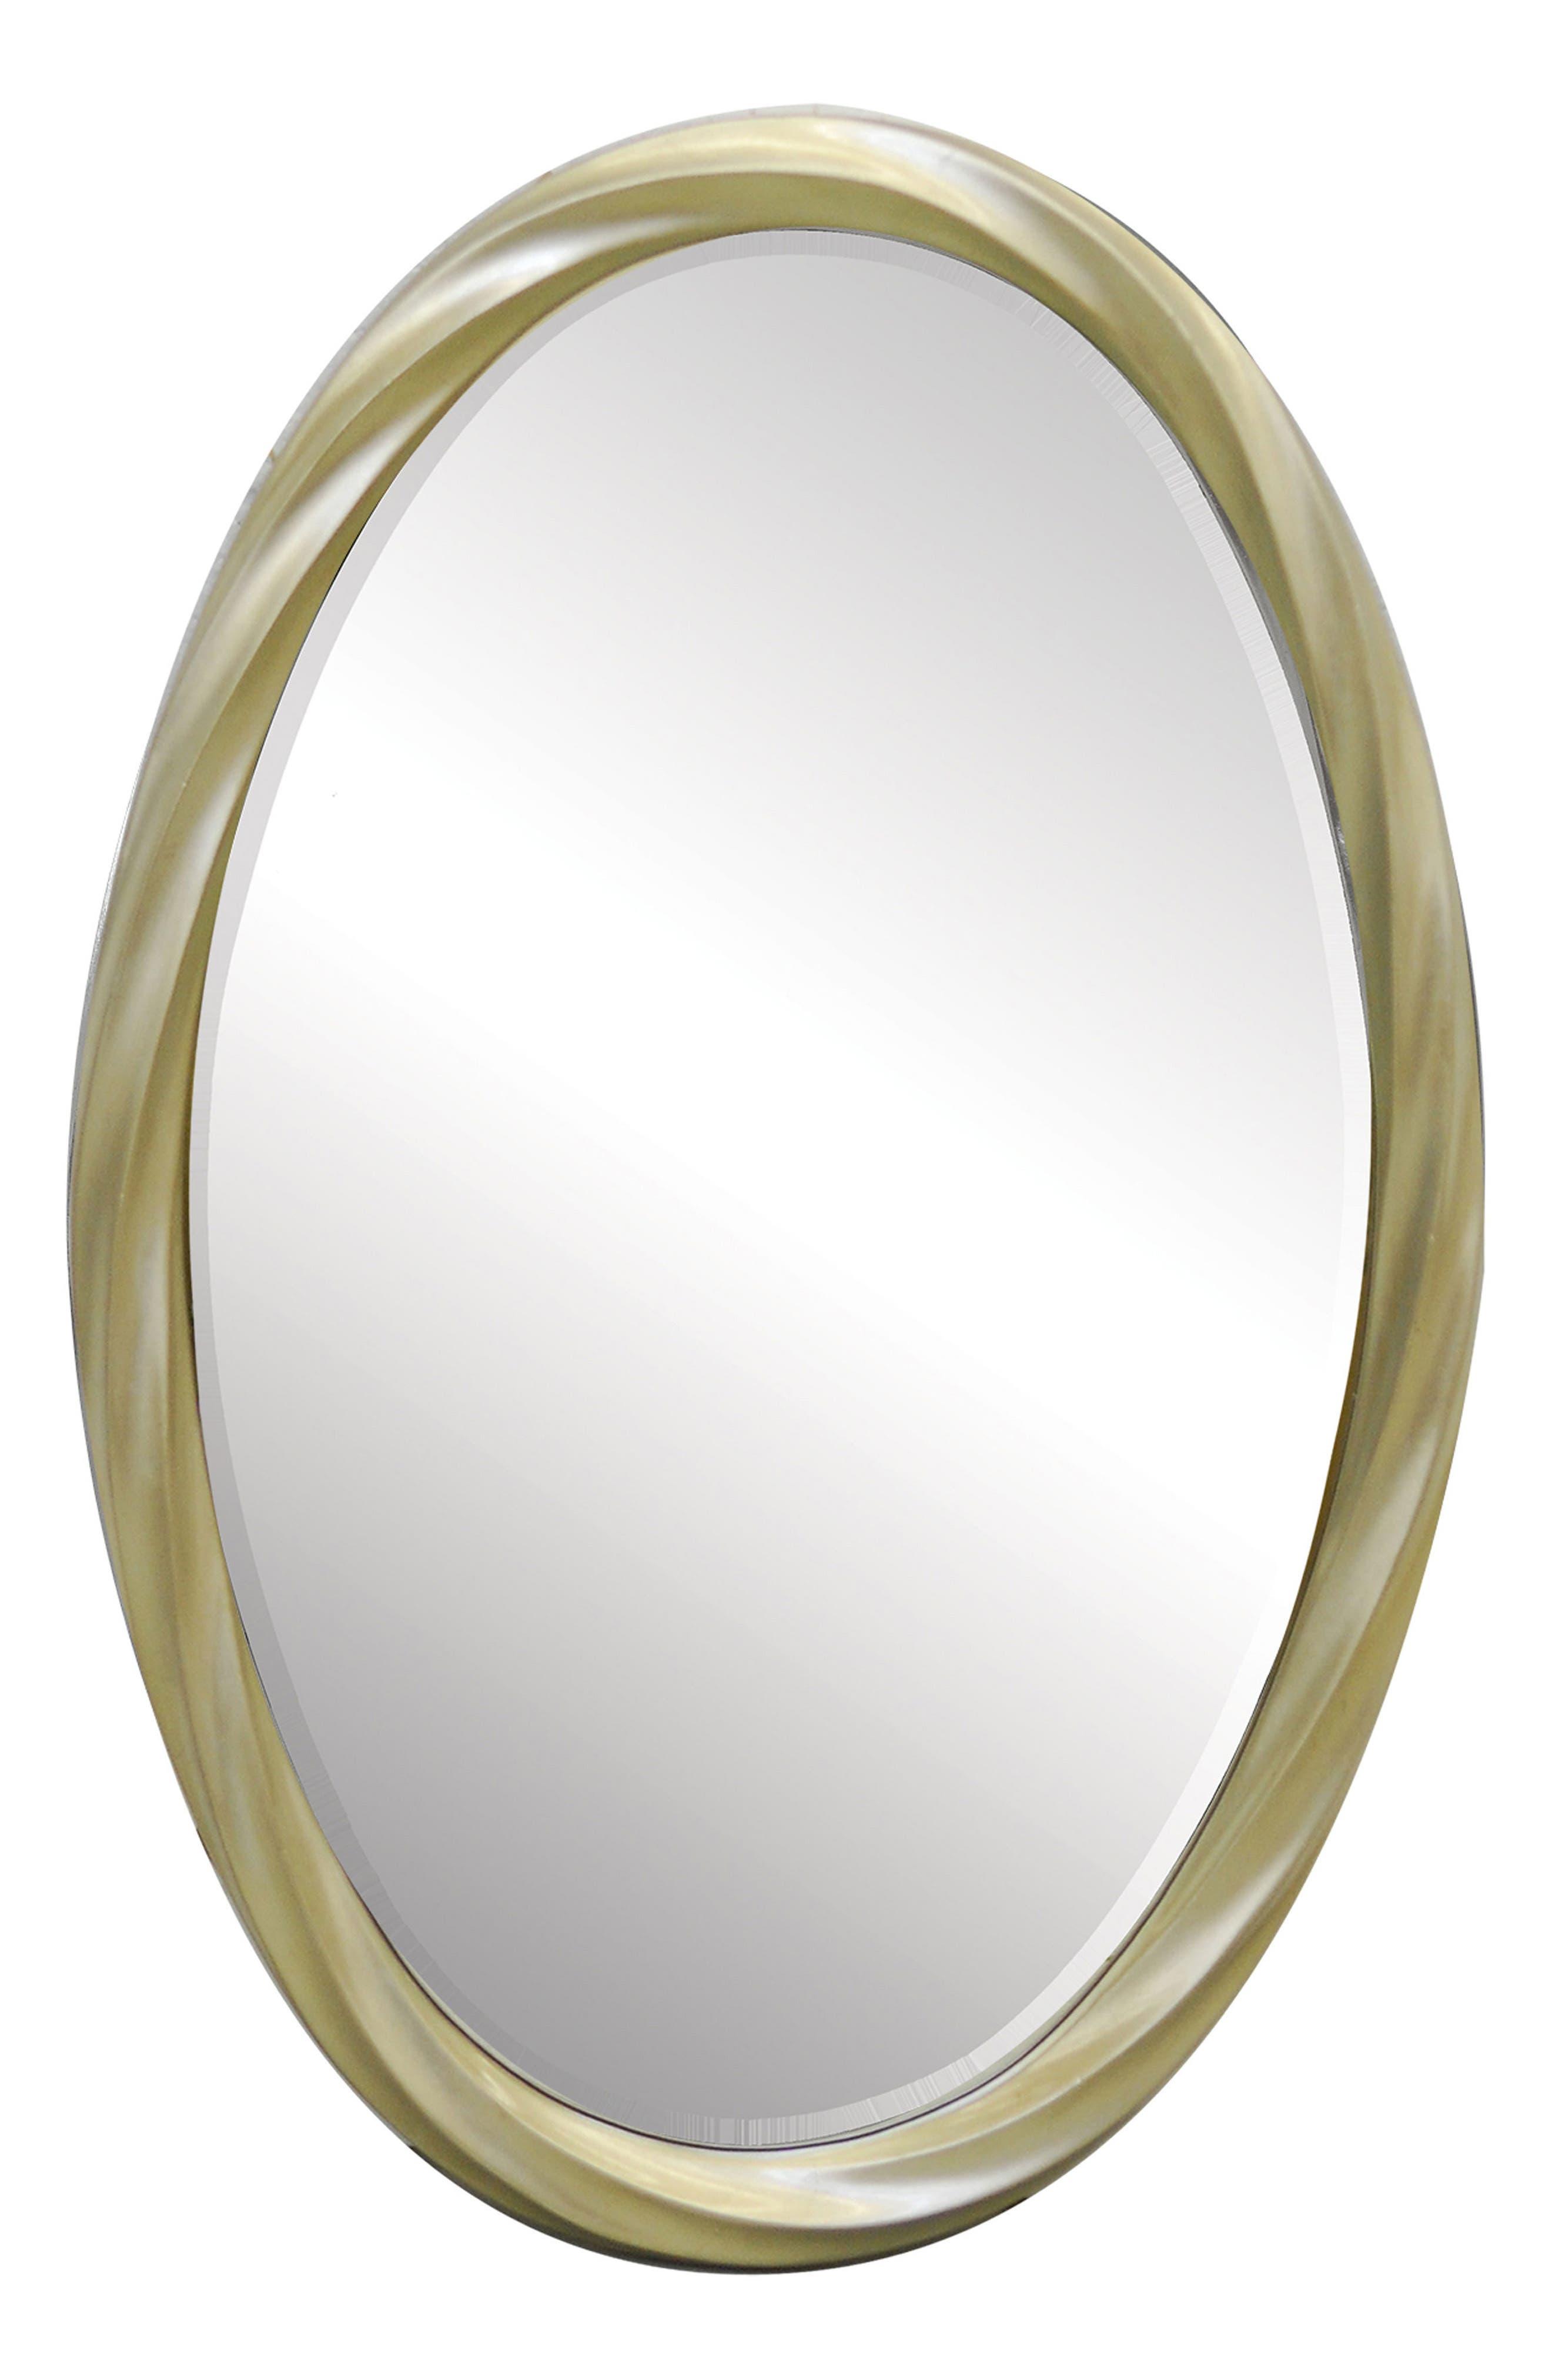 Wiltshire Mirror,                             Main thumbnail 1, color,                             040